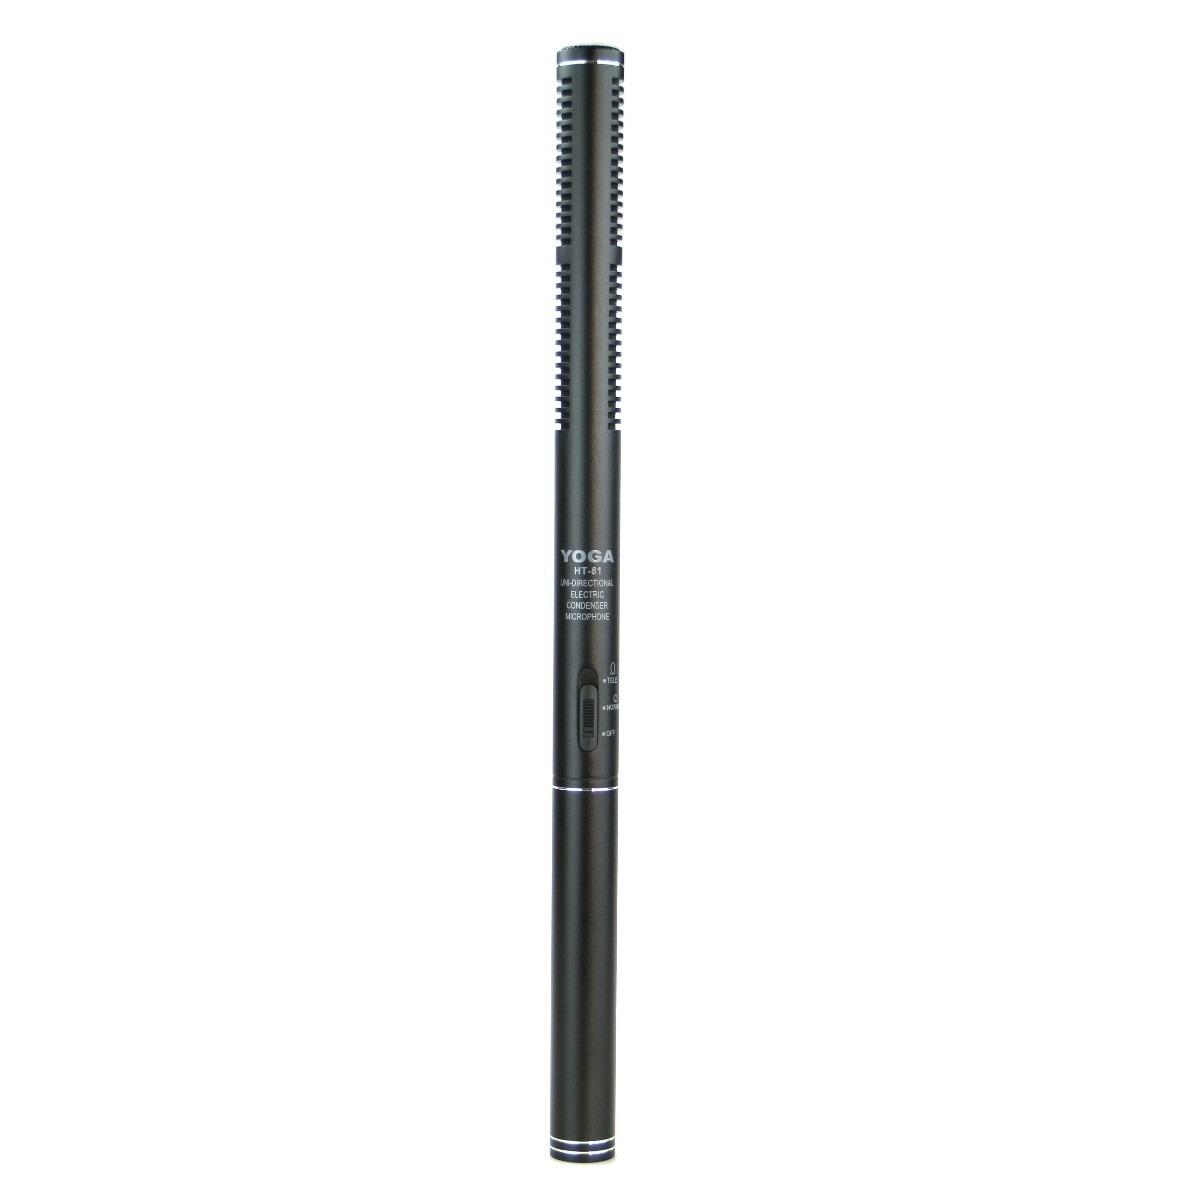 Microfone Direcional CSR Yoga HT 81 Shotgun